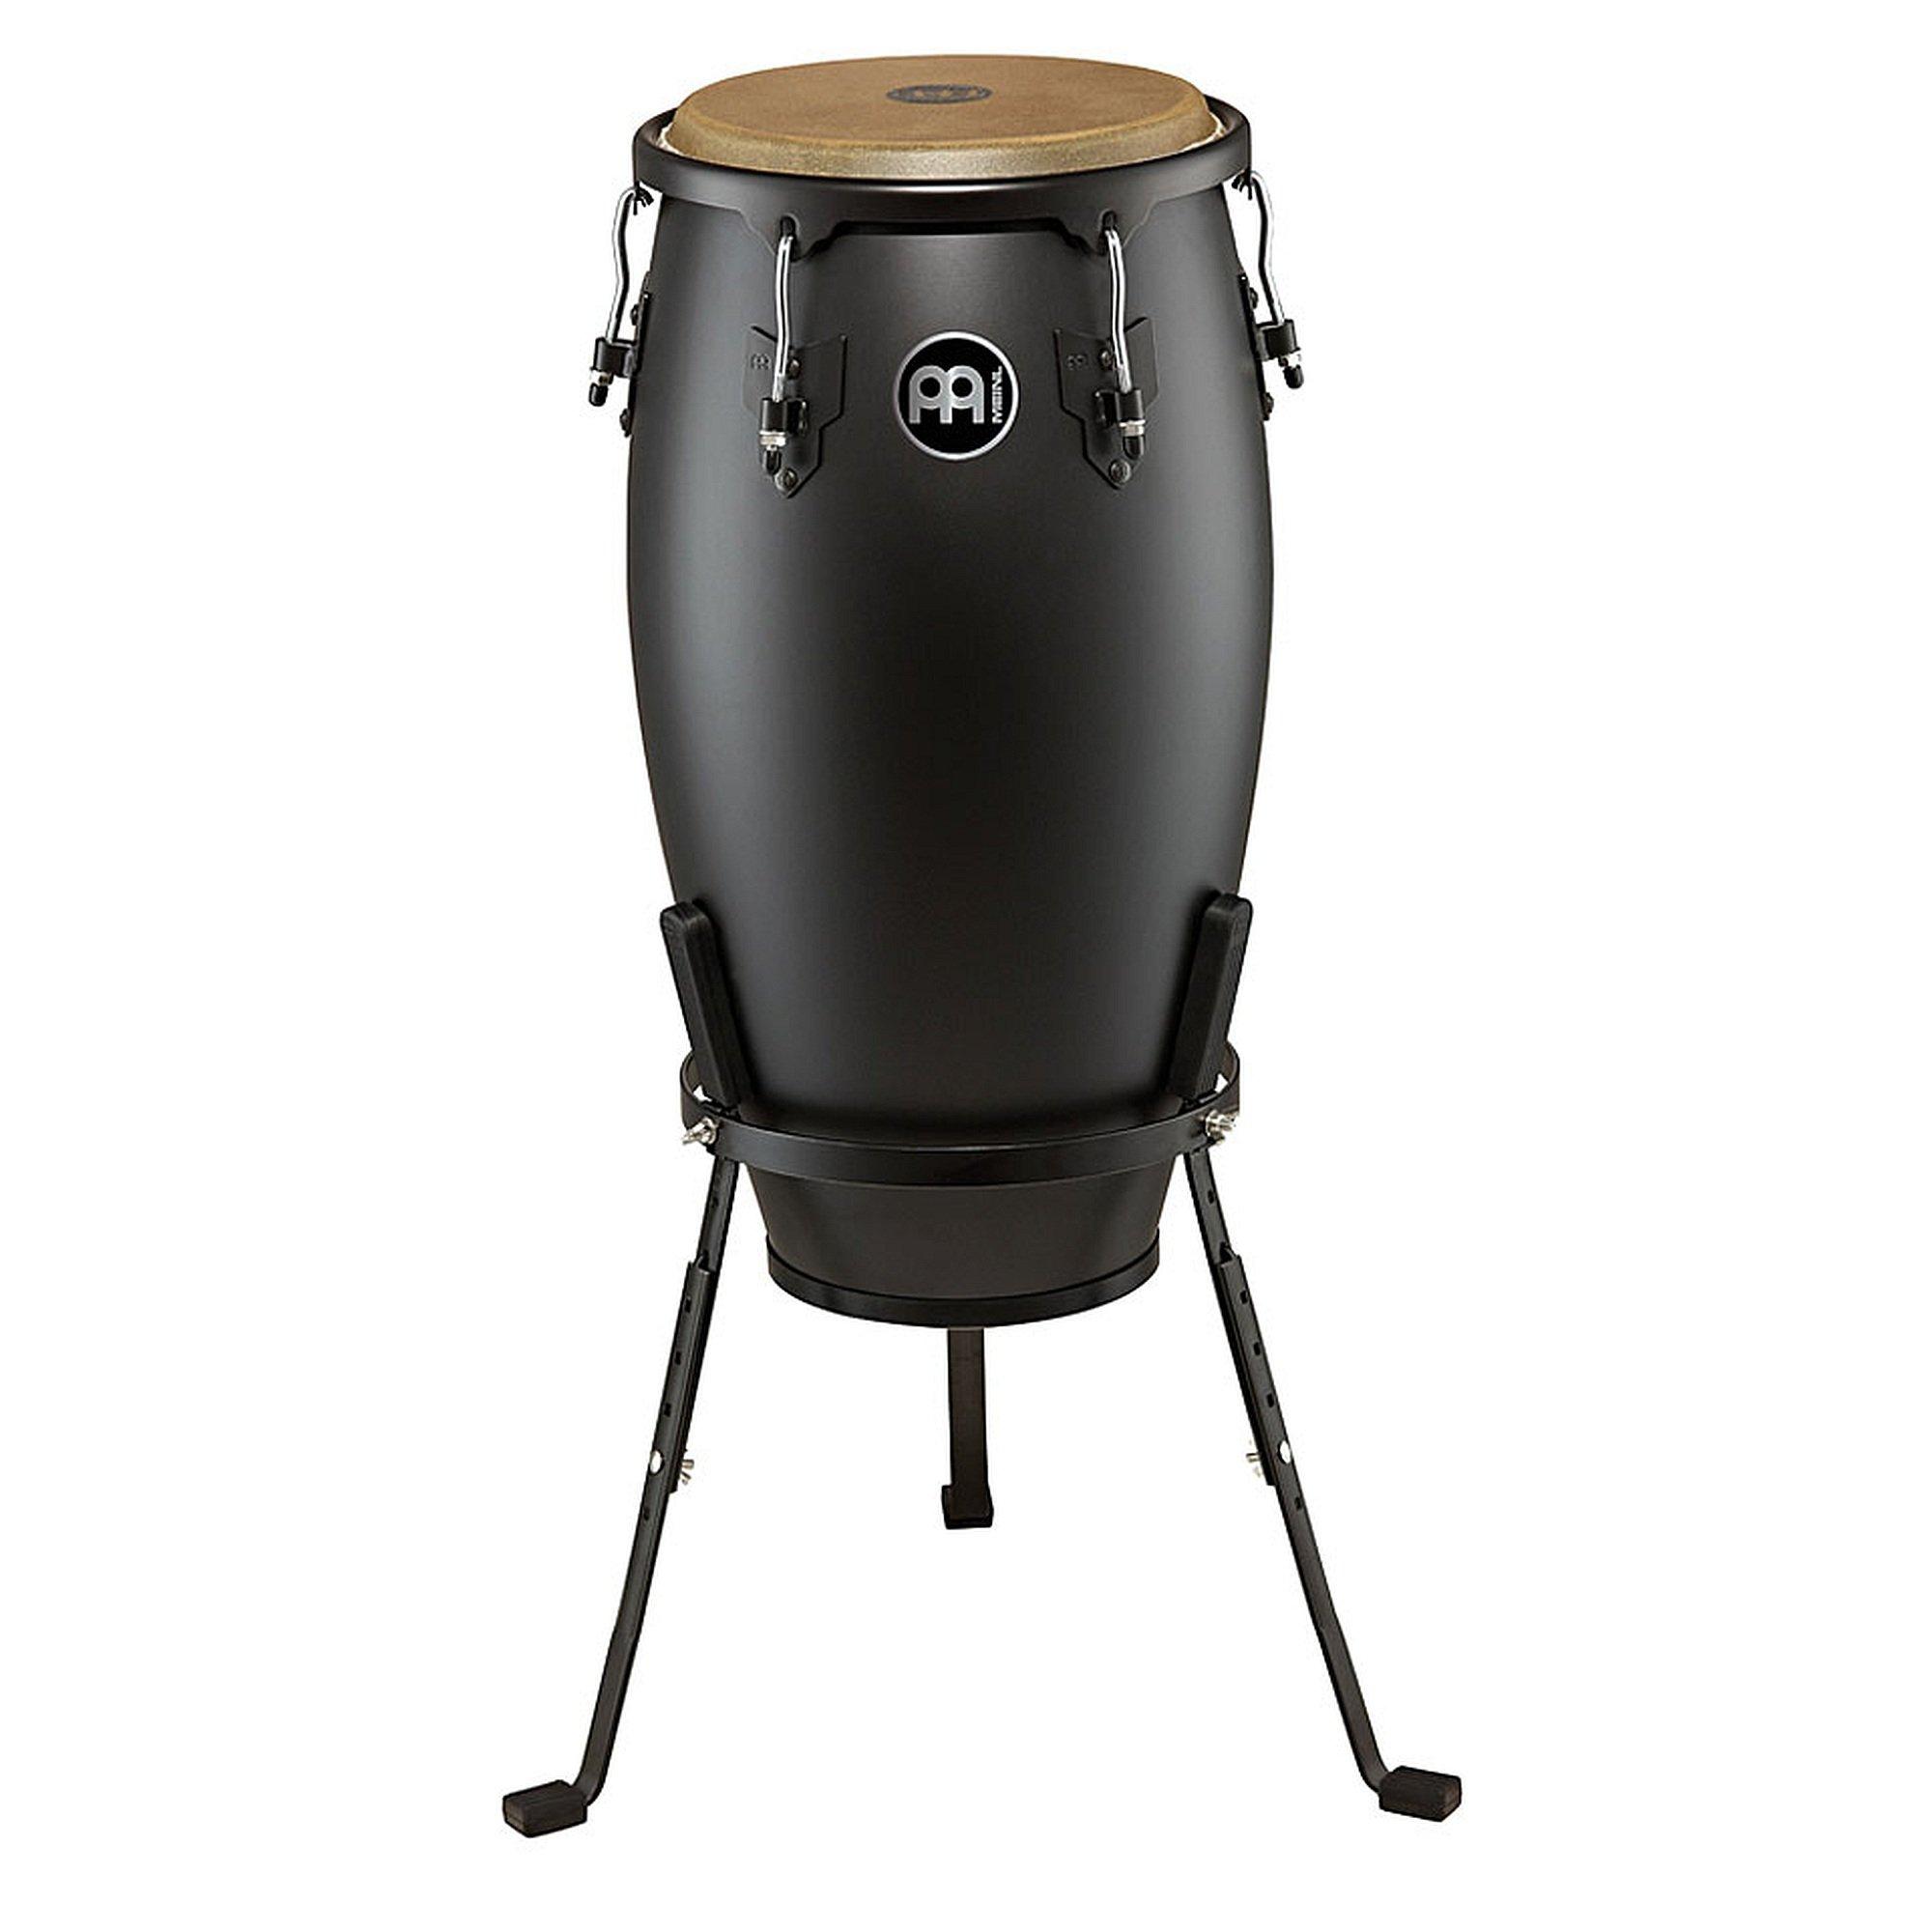 Meinl Percussion HC12PBK-M Headliner Designer Series 12-Inch Conga with Basket Stand, Phantom Black